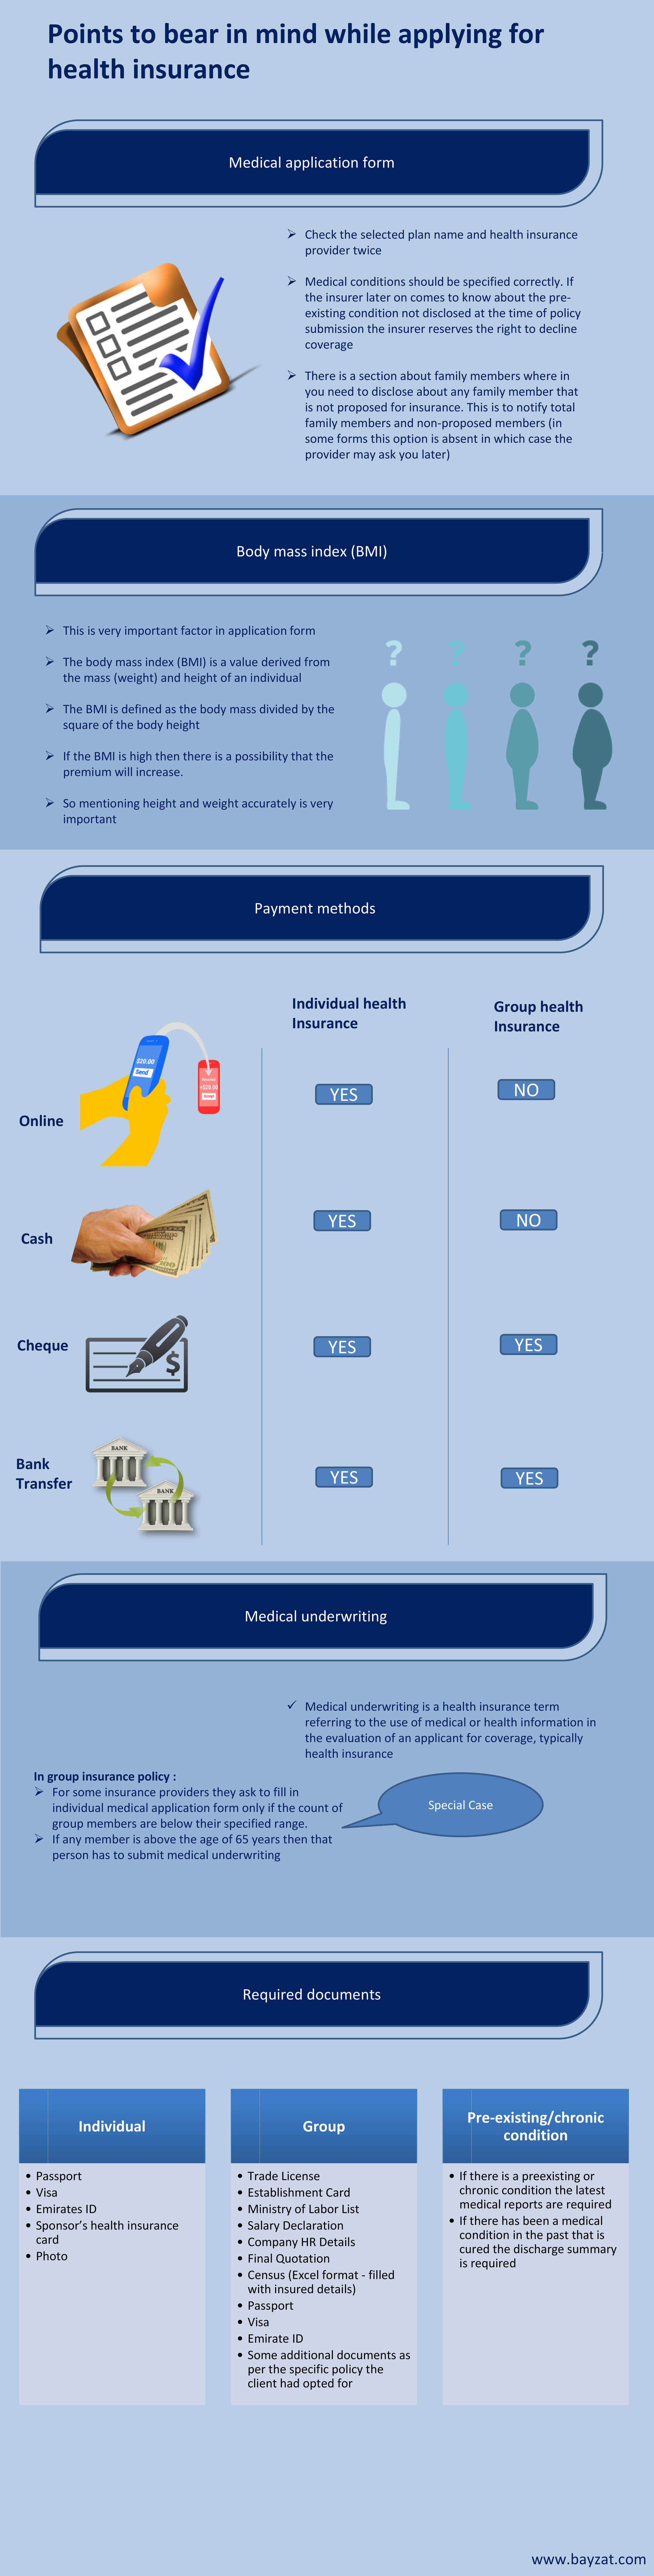 Health insurance application form in UAE Best health